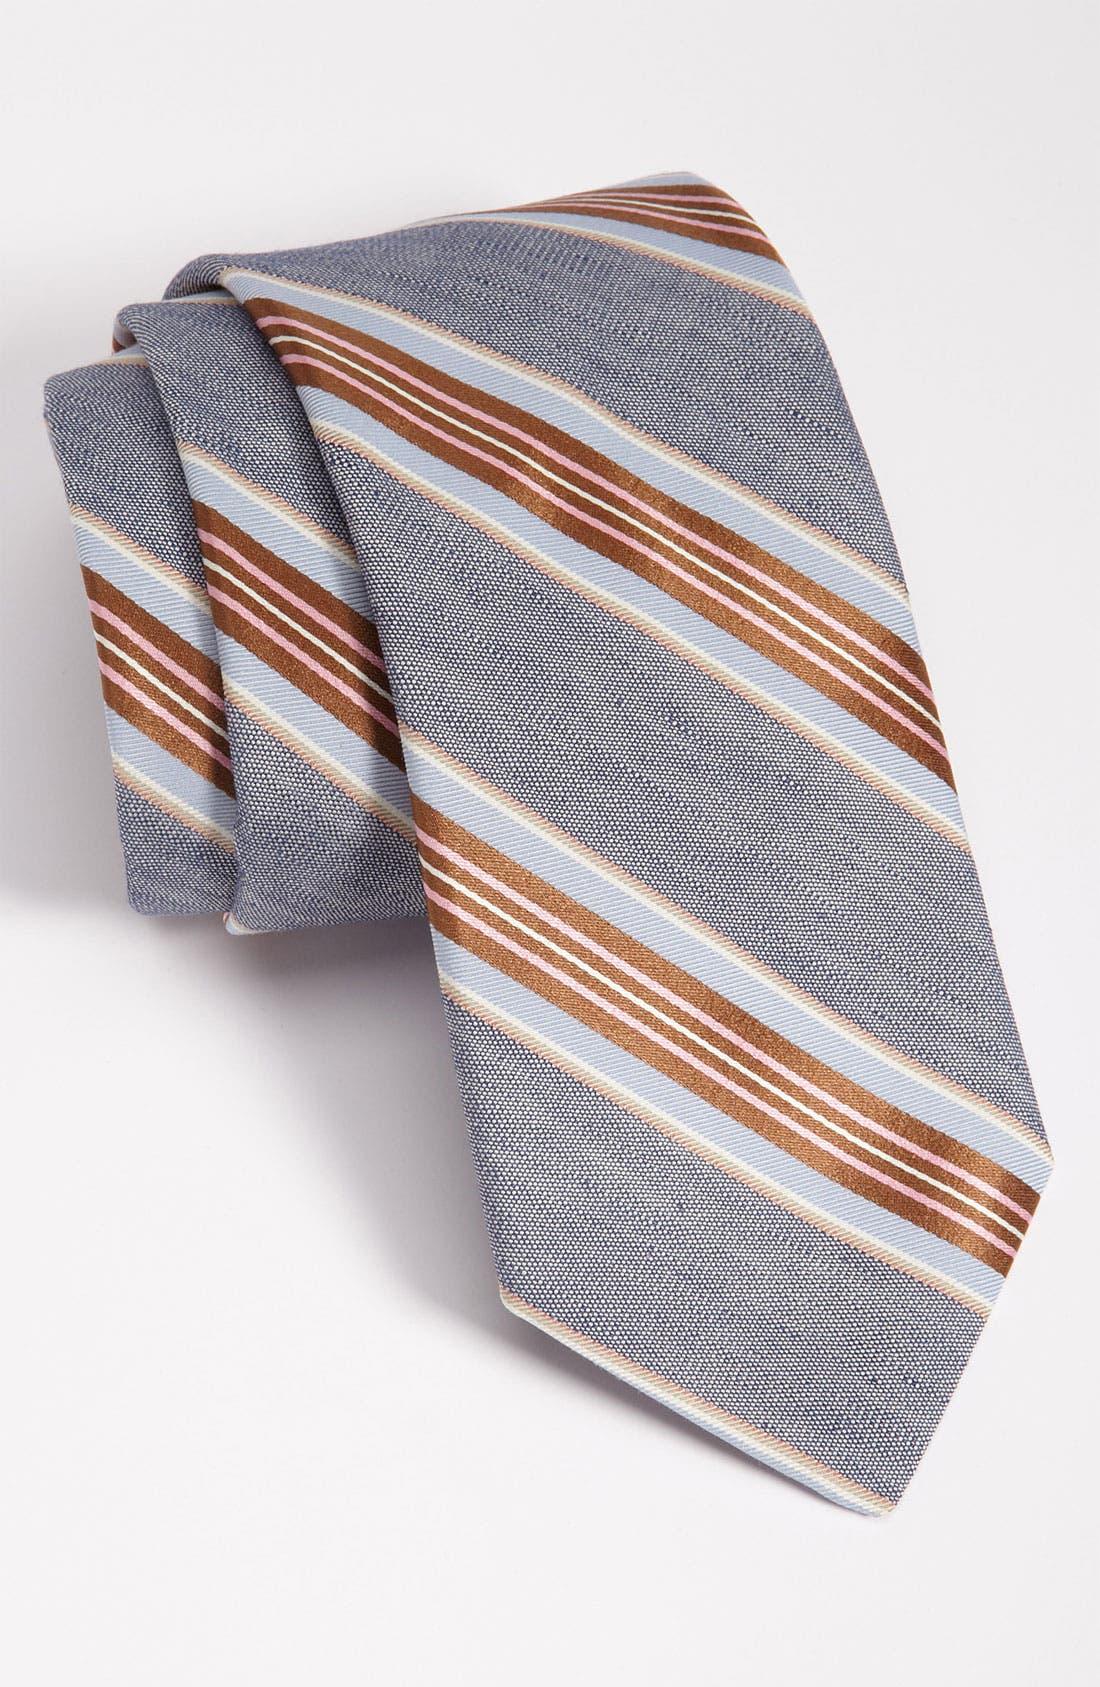 Main Image - John W. Nordstrom® Woven Tie